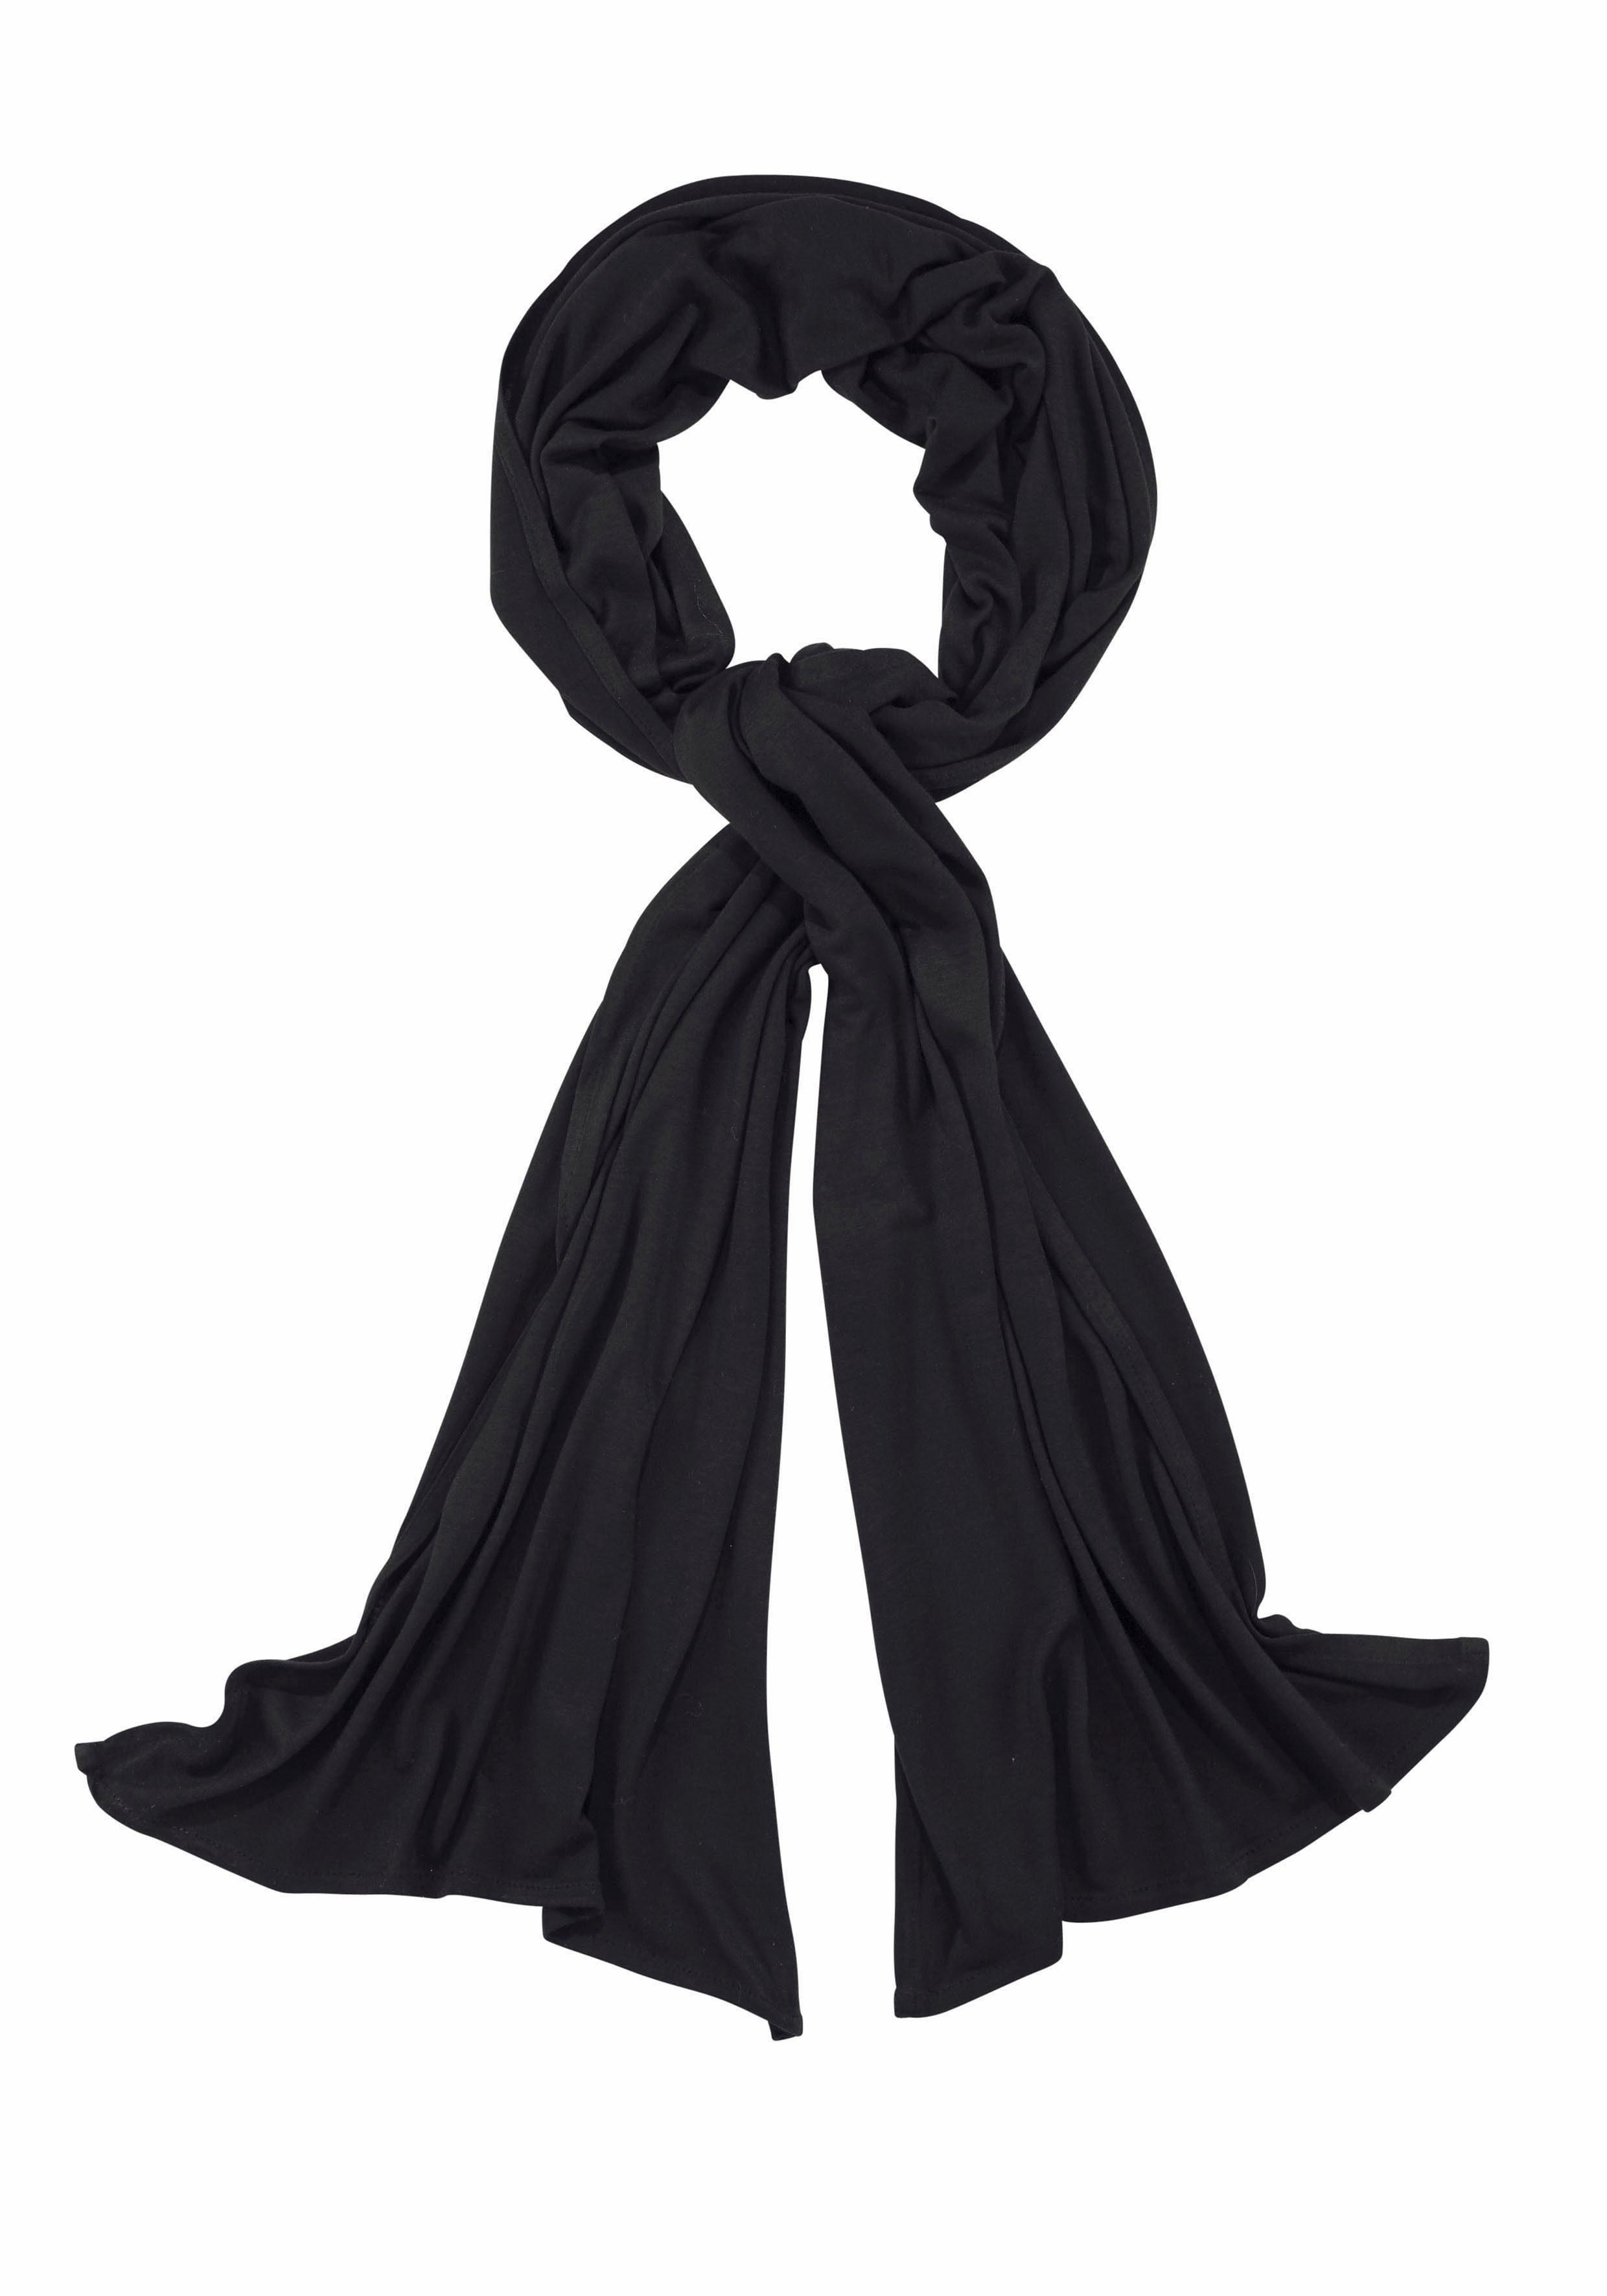 J. Jayz Modeschal, aus weichem Material